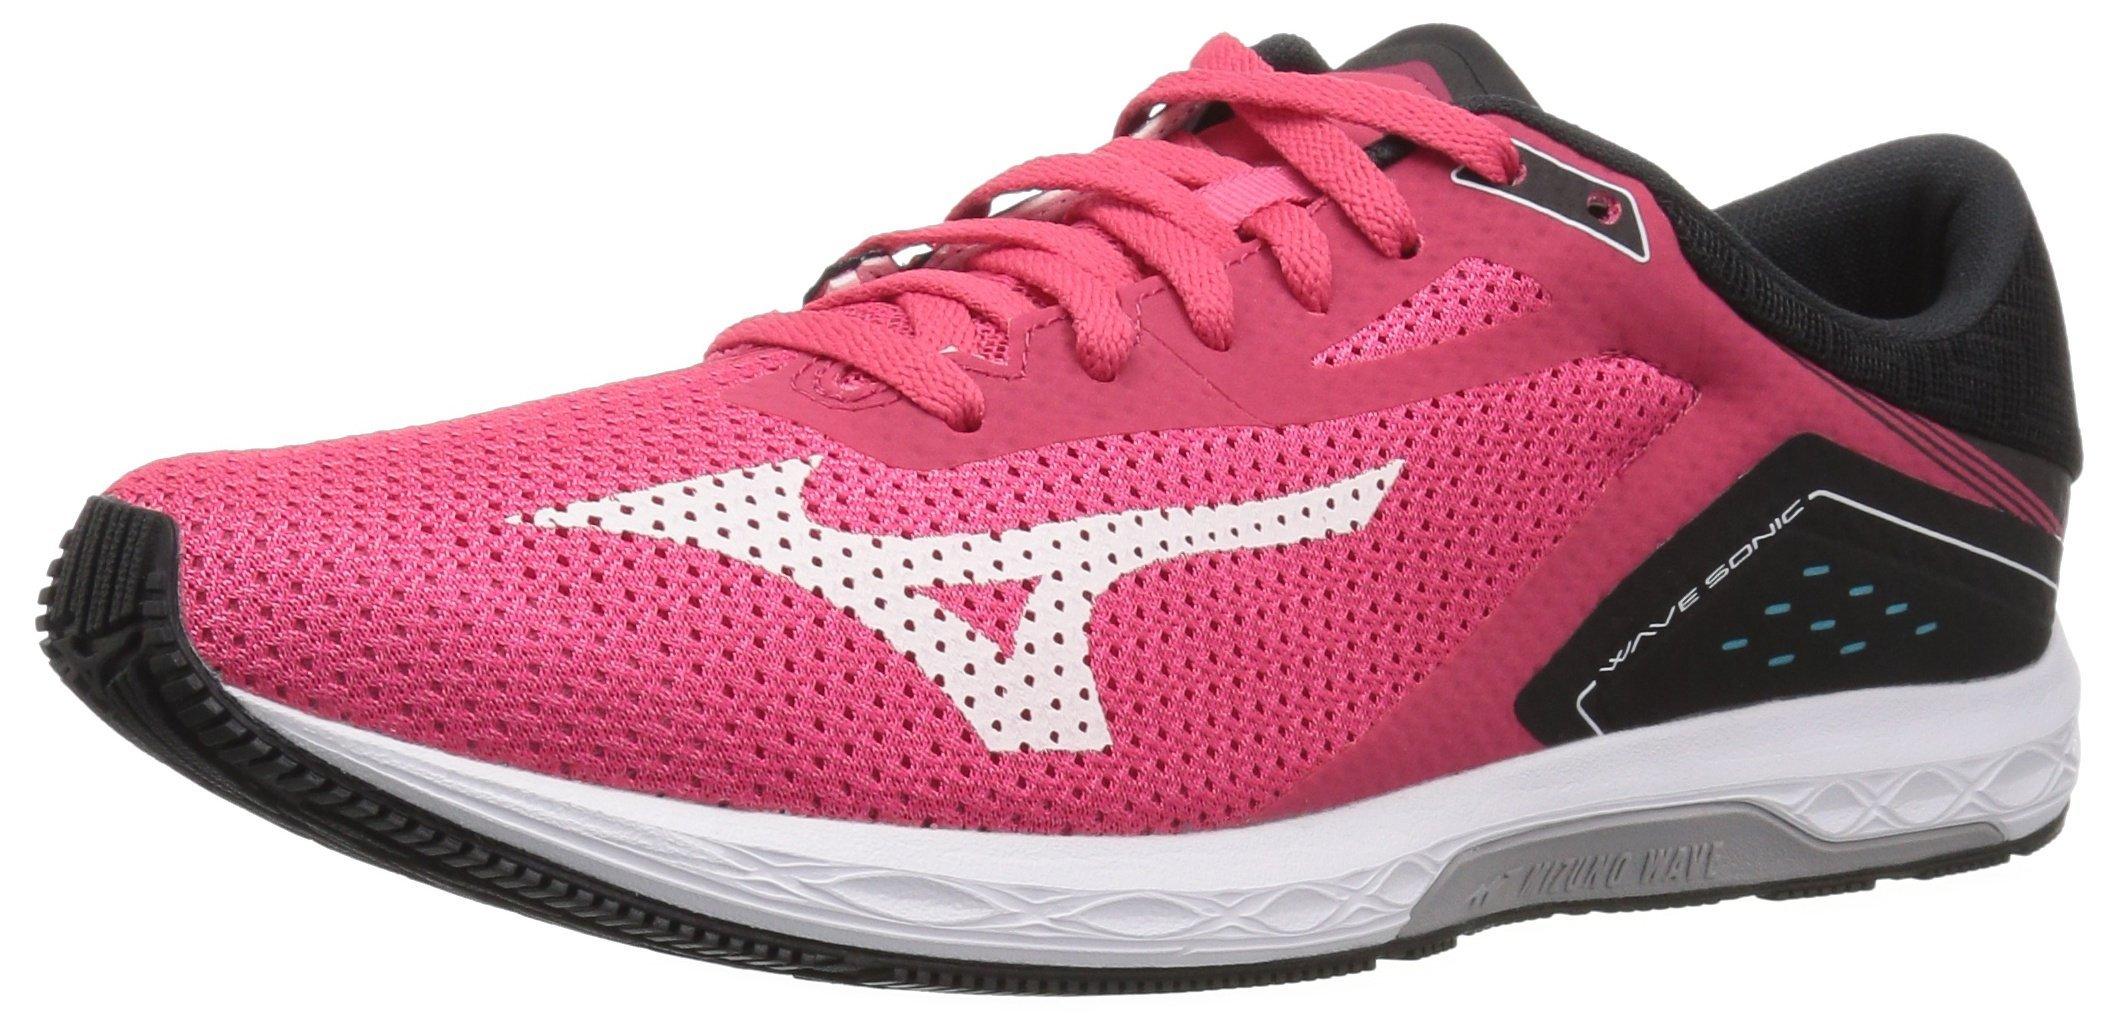 81v4gy71UIL - Mizuno Women's Wave Sonic Running Shoe